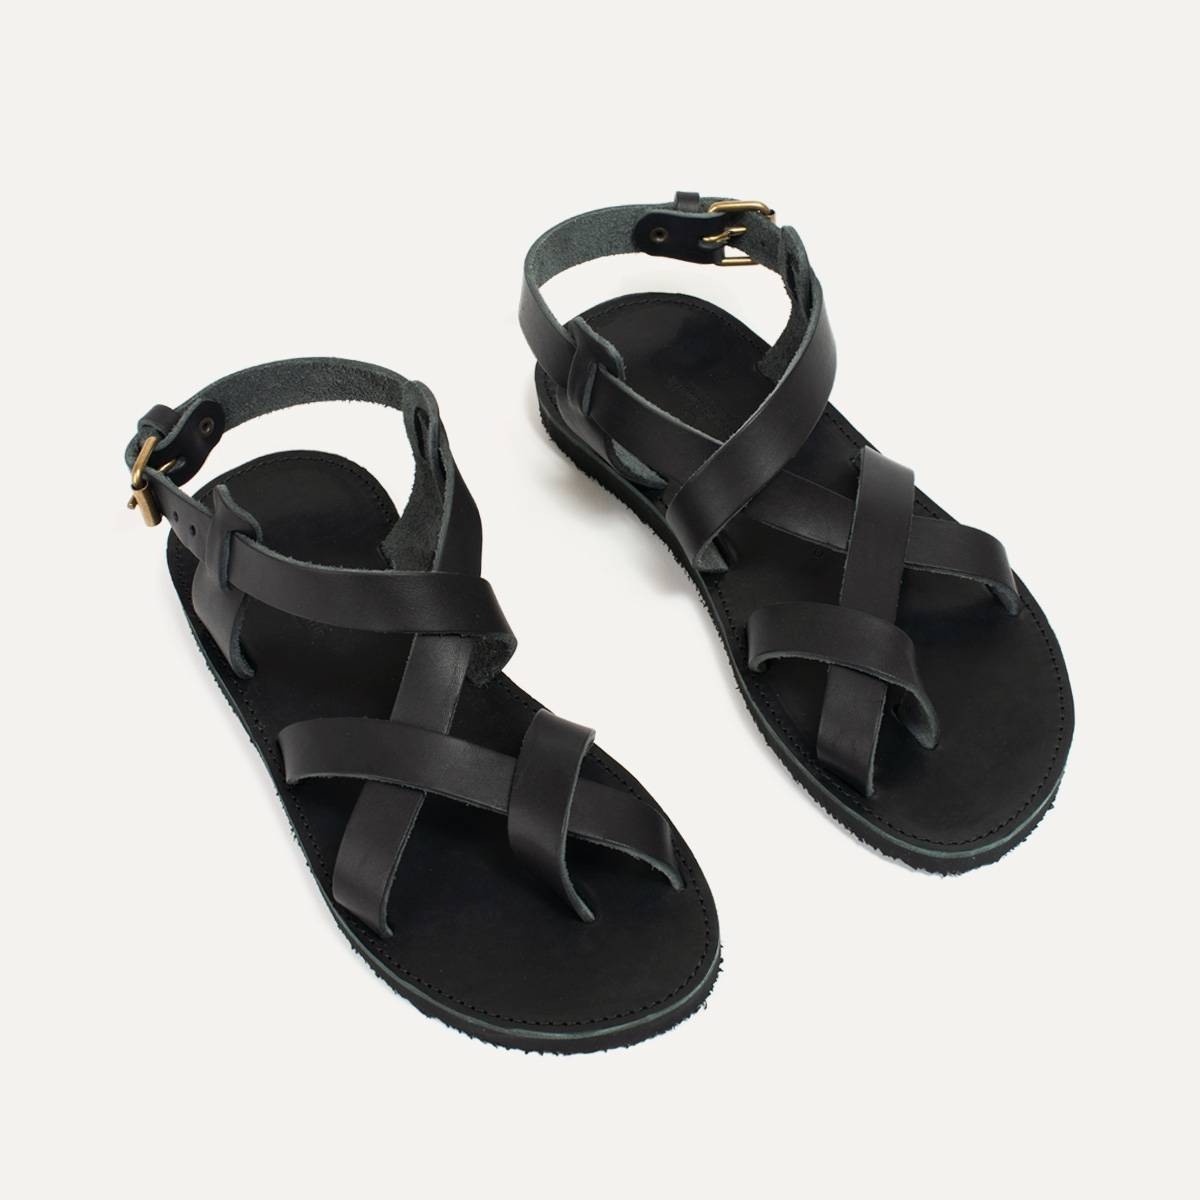 Lhassa leather sandals - Black (image n°7)